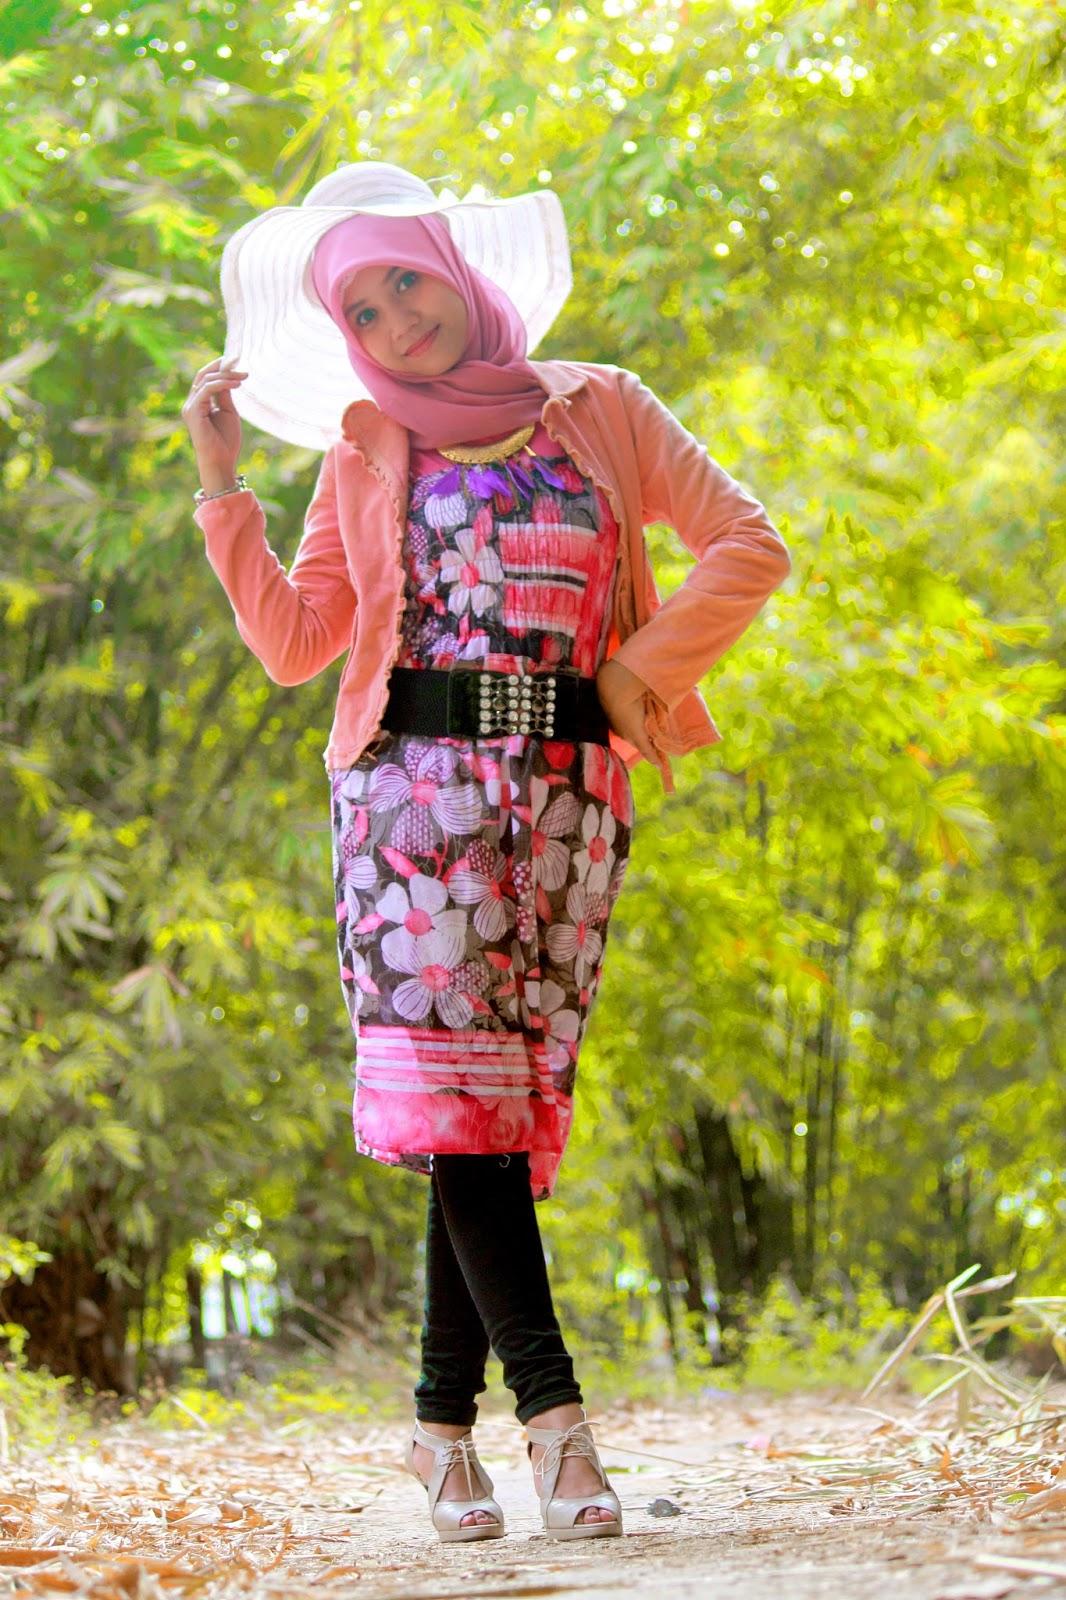 Hunting Model hijab cantik Hani Nirmalasari Jibaer Mahasiswa Kampus manis dian pelangi 2016 Hunting Model hijab cantik Hani Nirmalasari Jibaer Mahasiswa Kampus manis dian pelangi terbaru Hunting Model hijab cantik Hani Nirmalasari Jibaer Mahasiswa Kampus manis dengan celana jeans Hunting Model